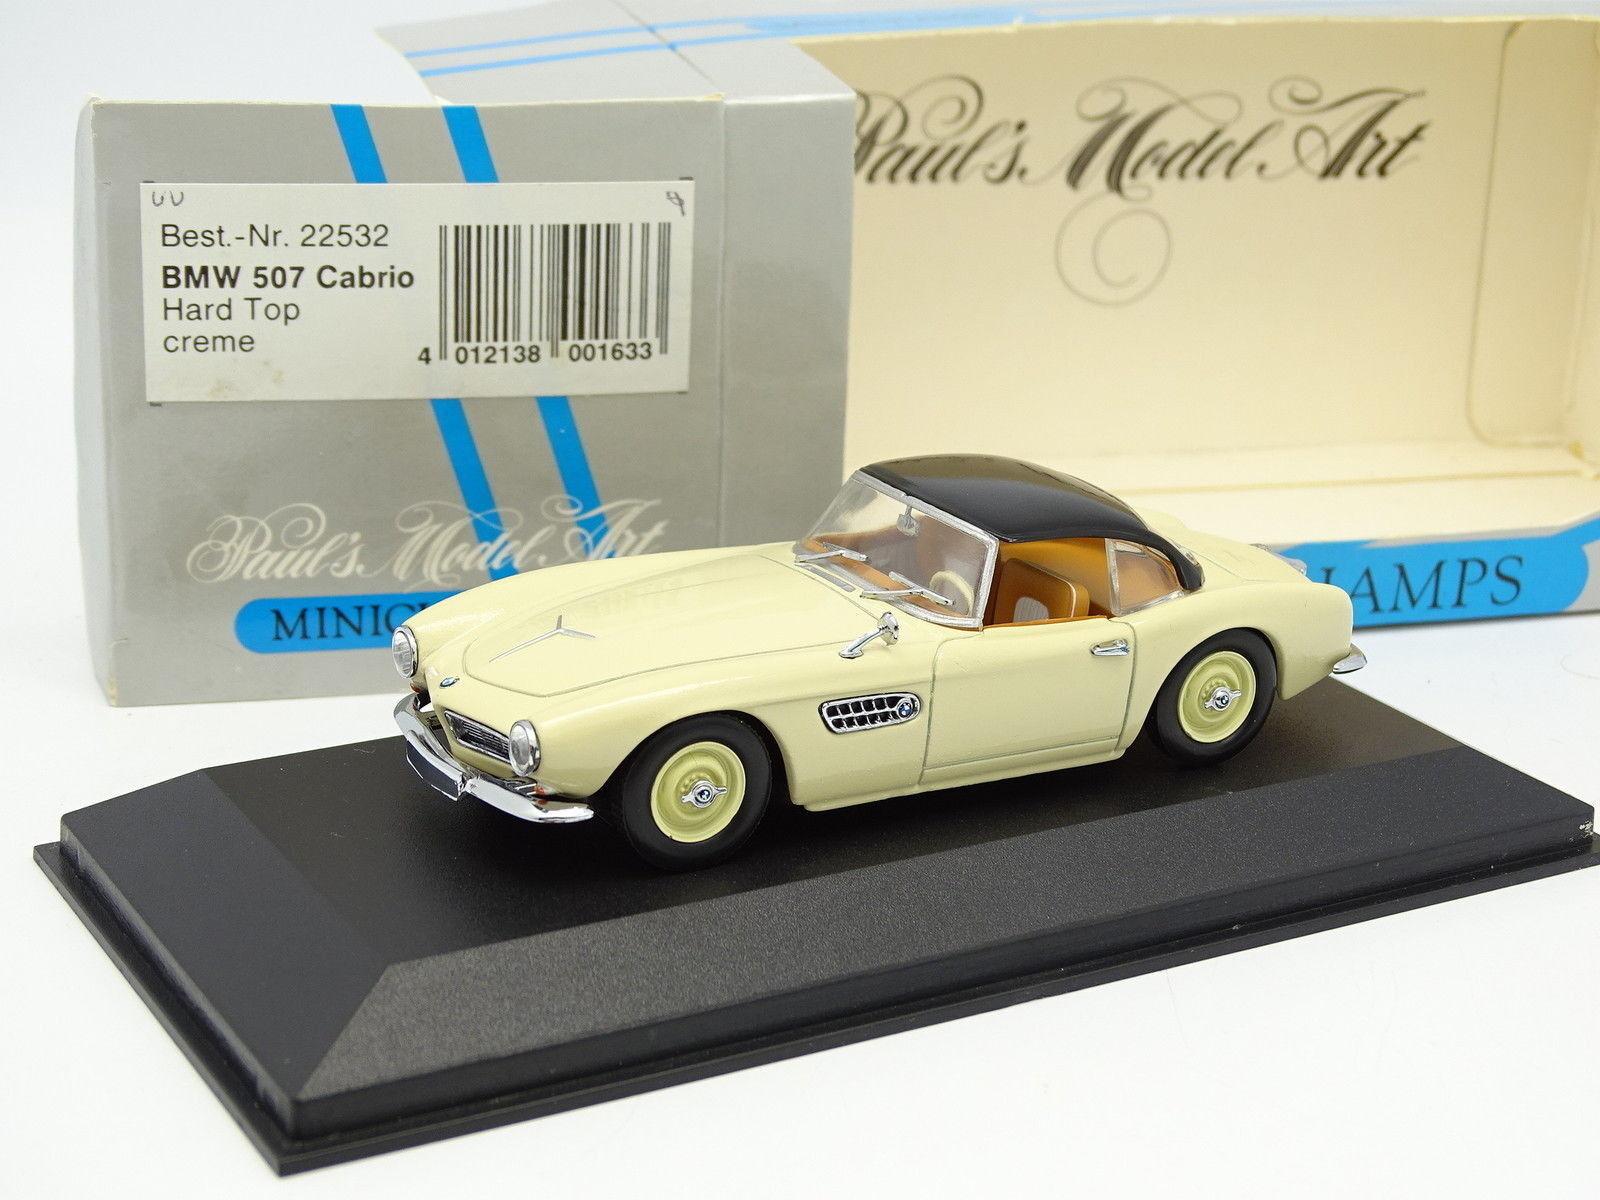 Minichamps 1 43 - BMW 507 Cabrio Hard Top Crème